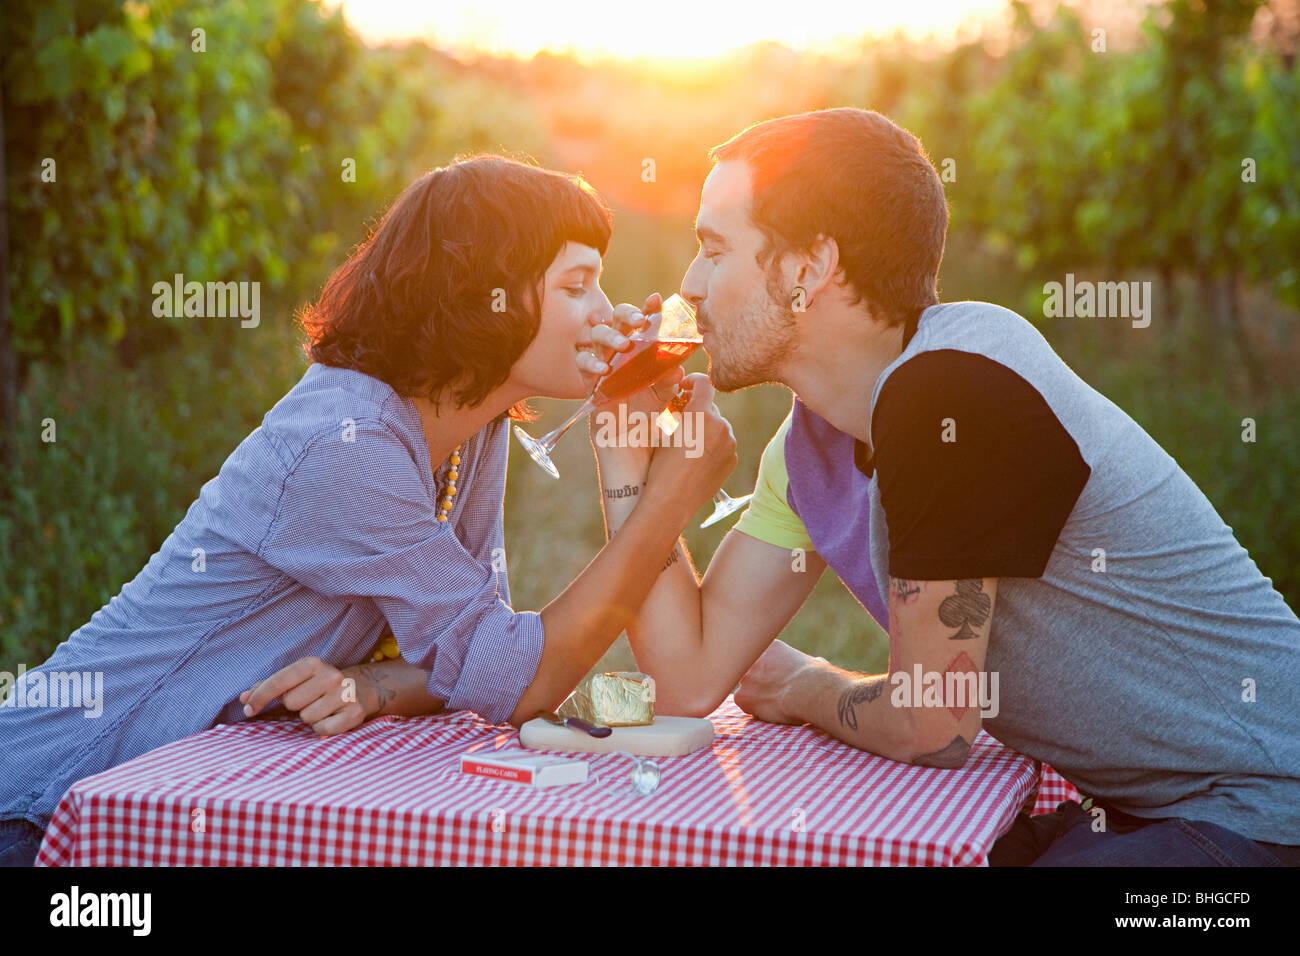 Couple drinking wine dans un champ Photo Stock